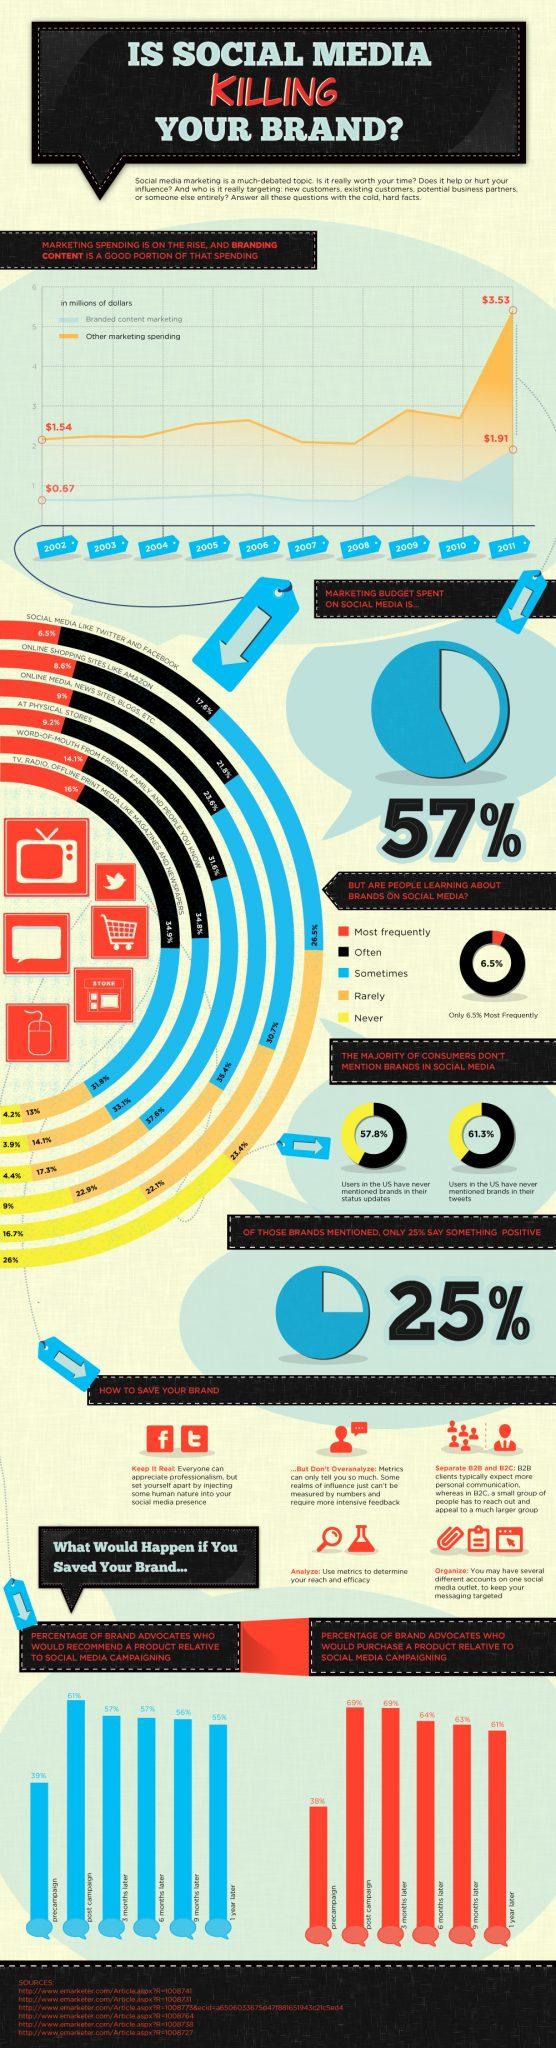 Social Media Advertising Awareness Infographic